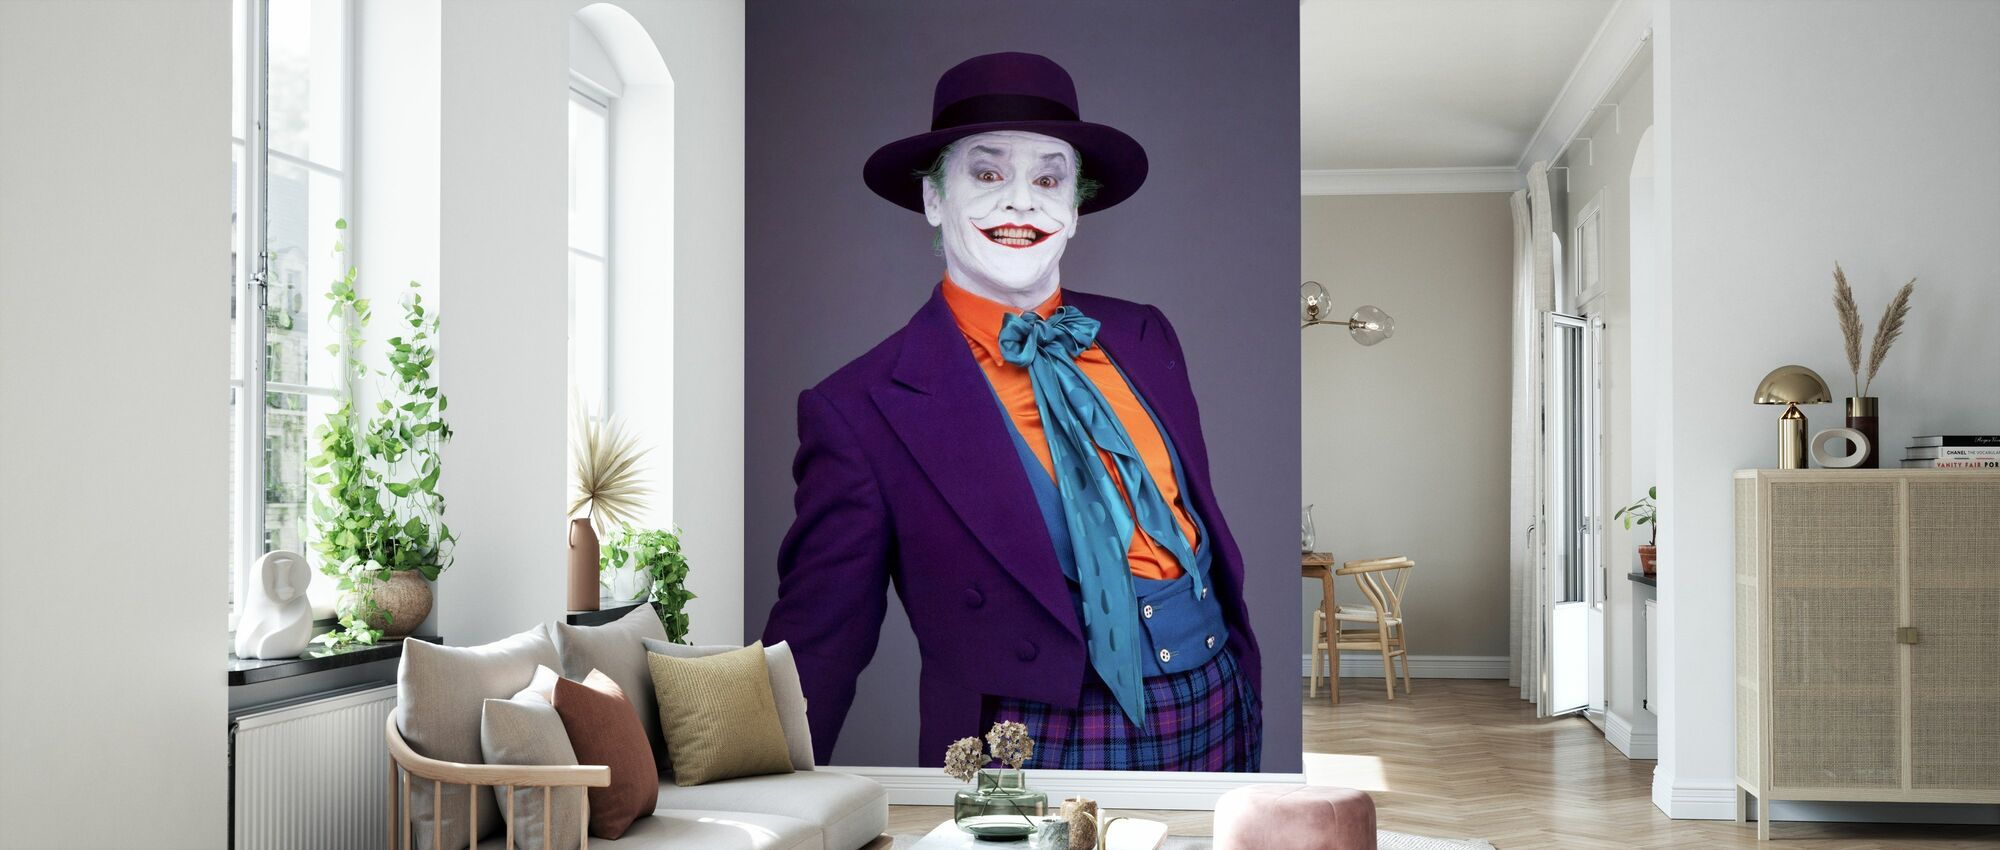 Jack Nicholson in Batman - Wallpaper - Living Room